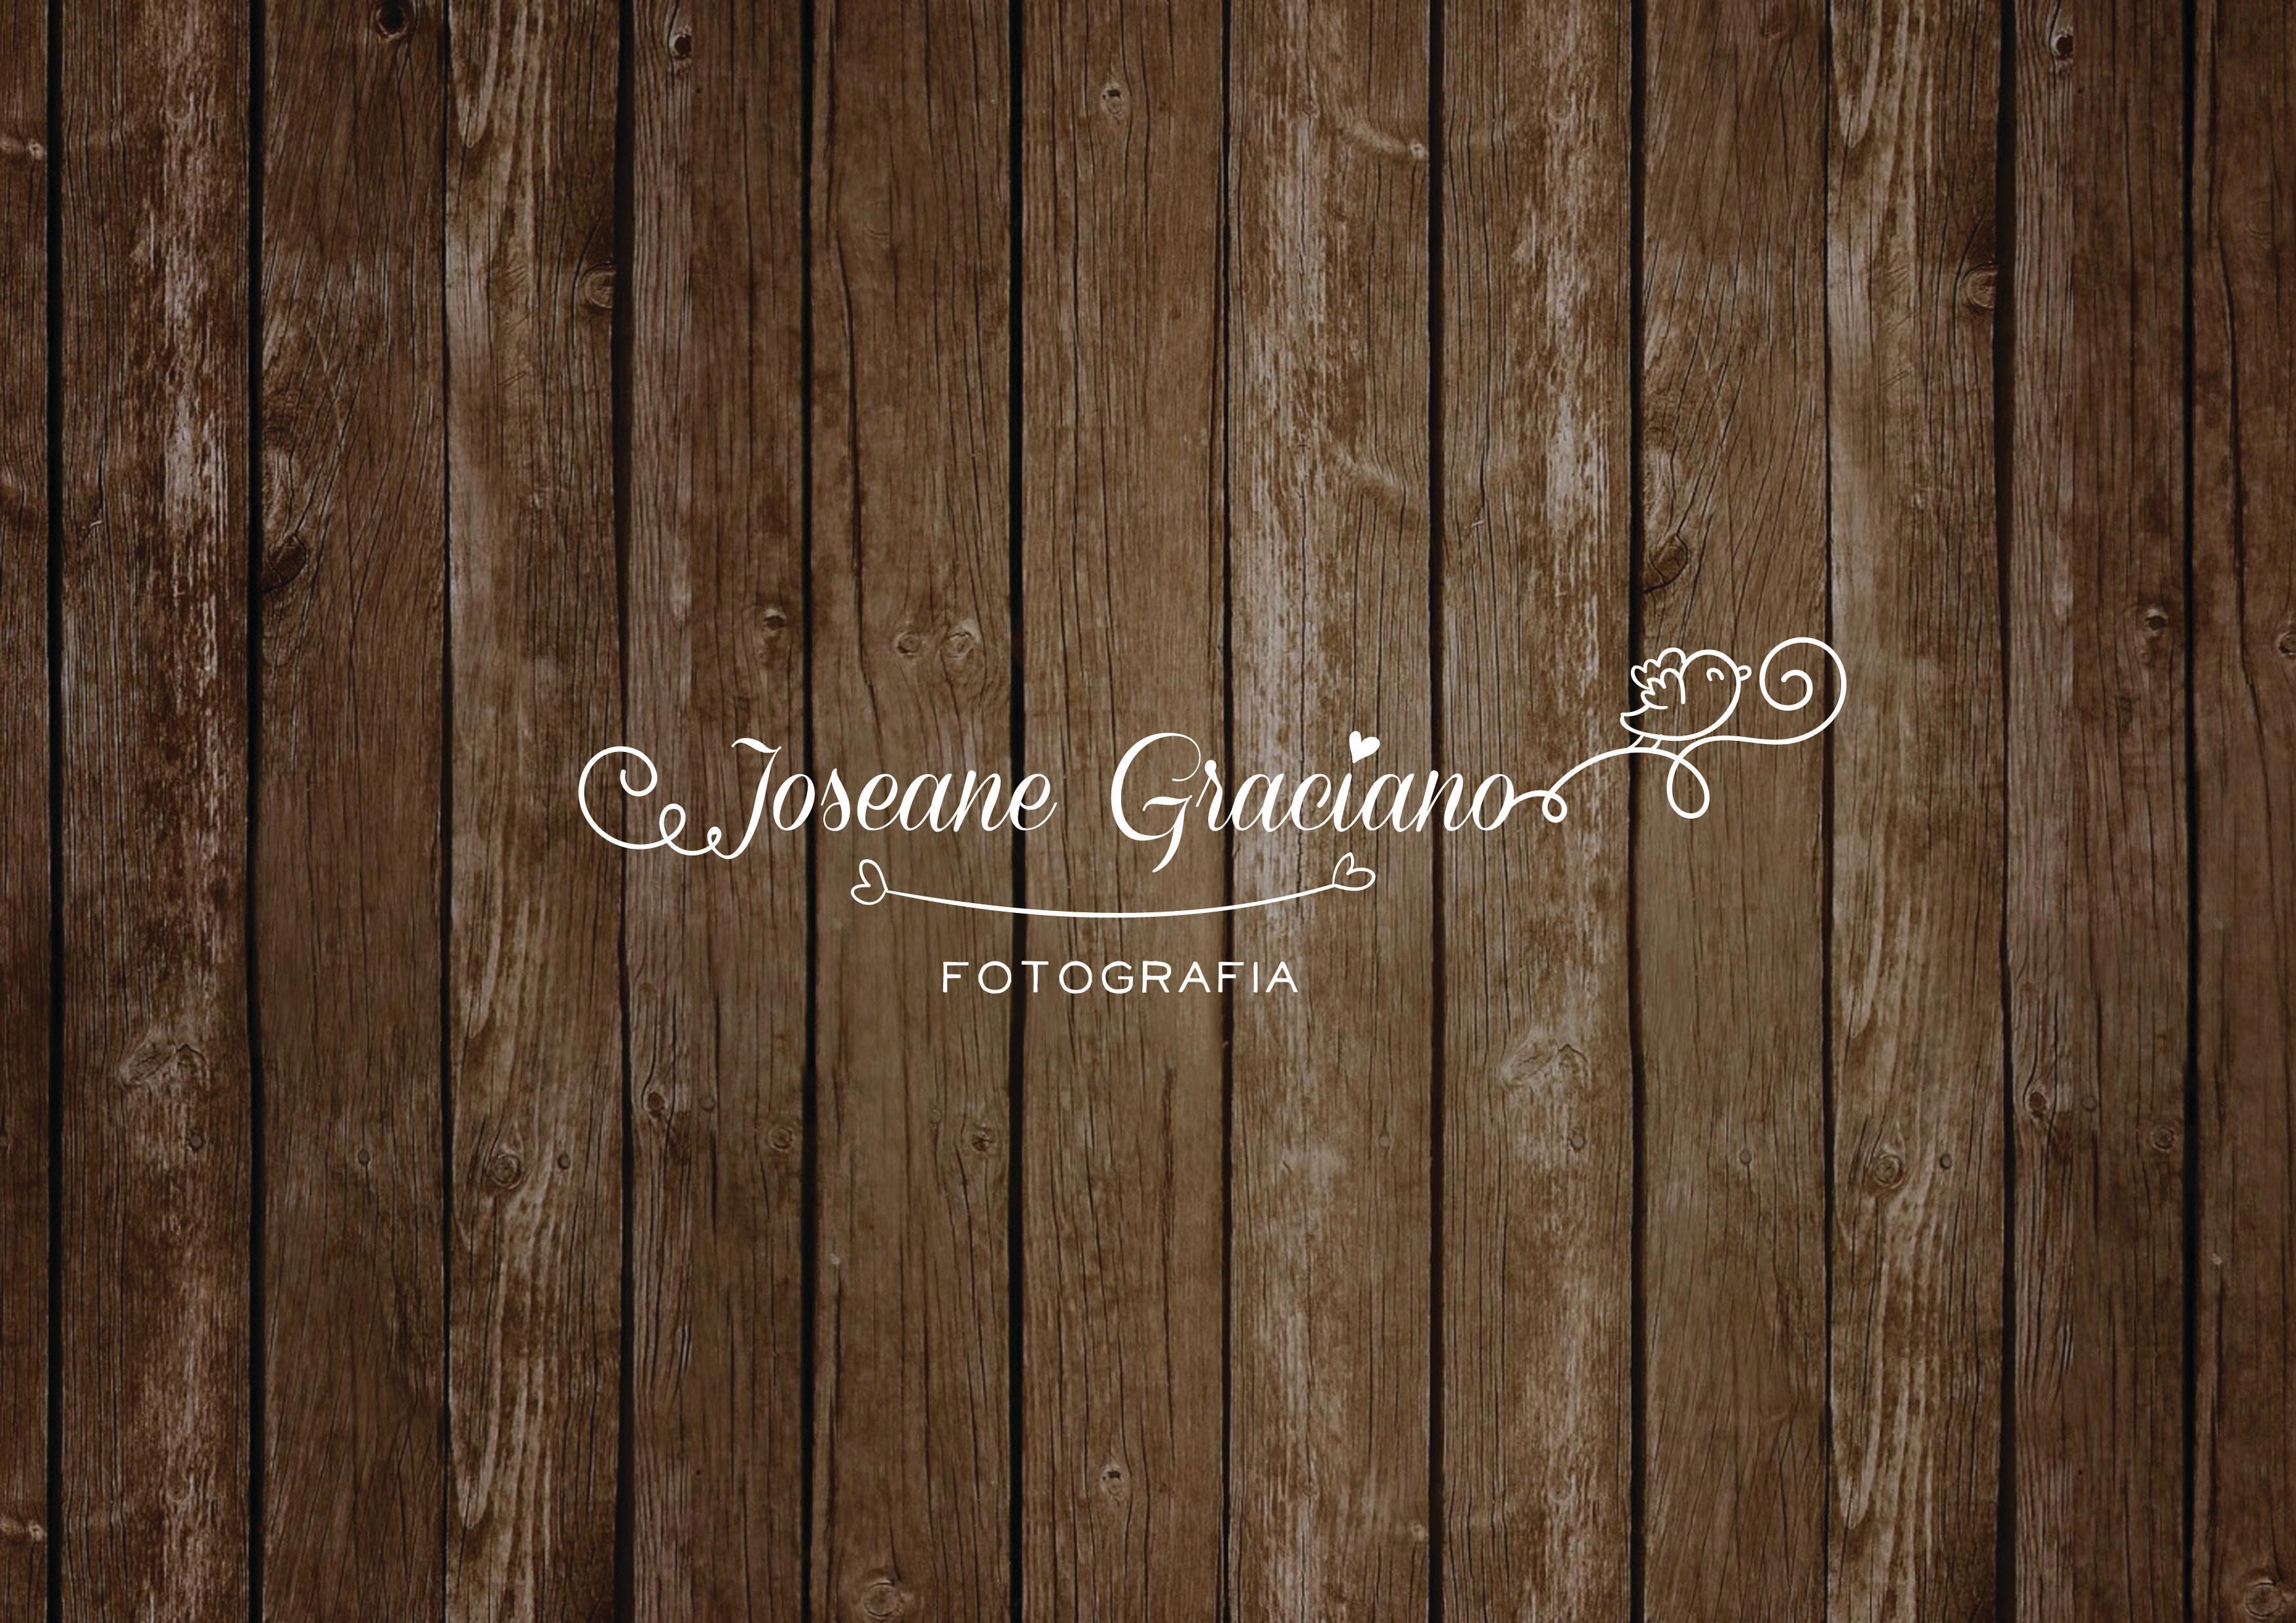 Joseane Graciano